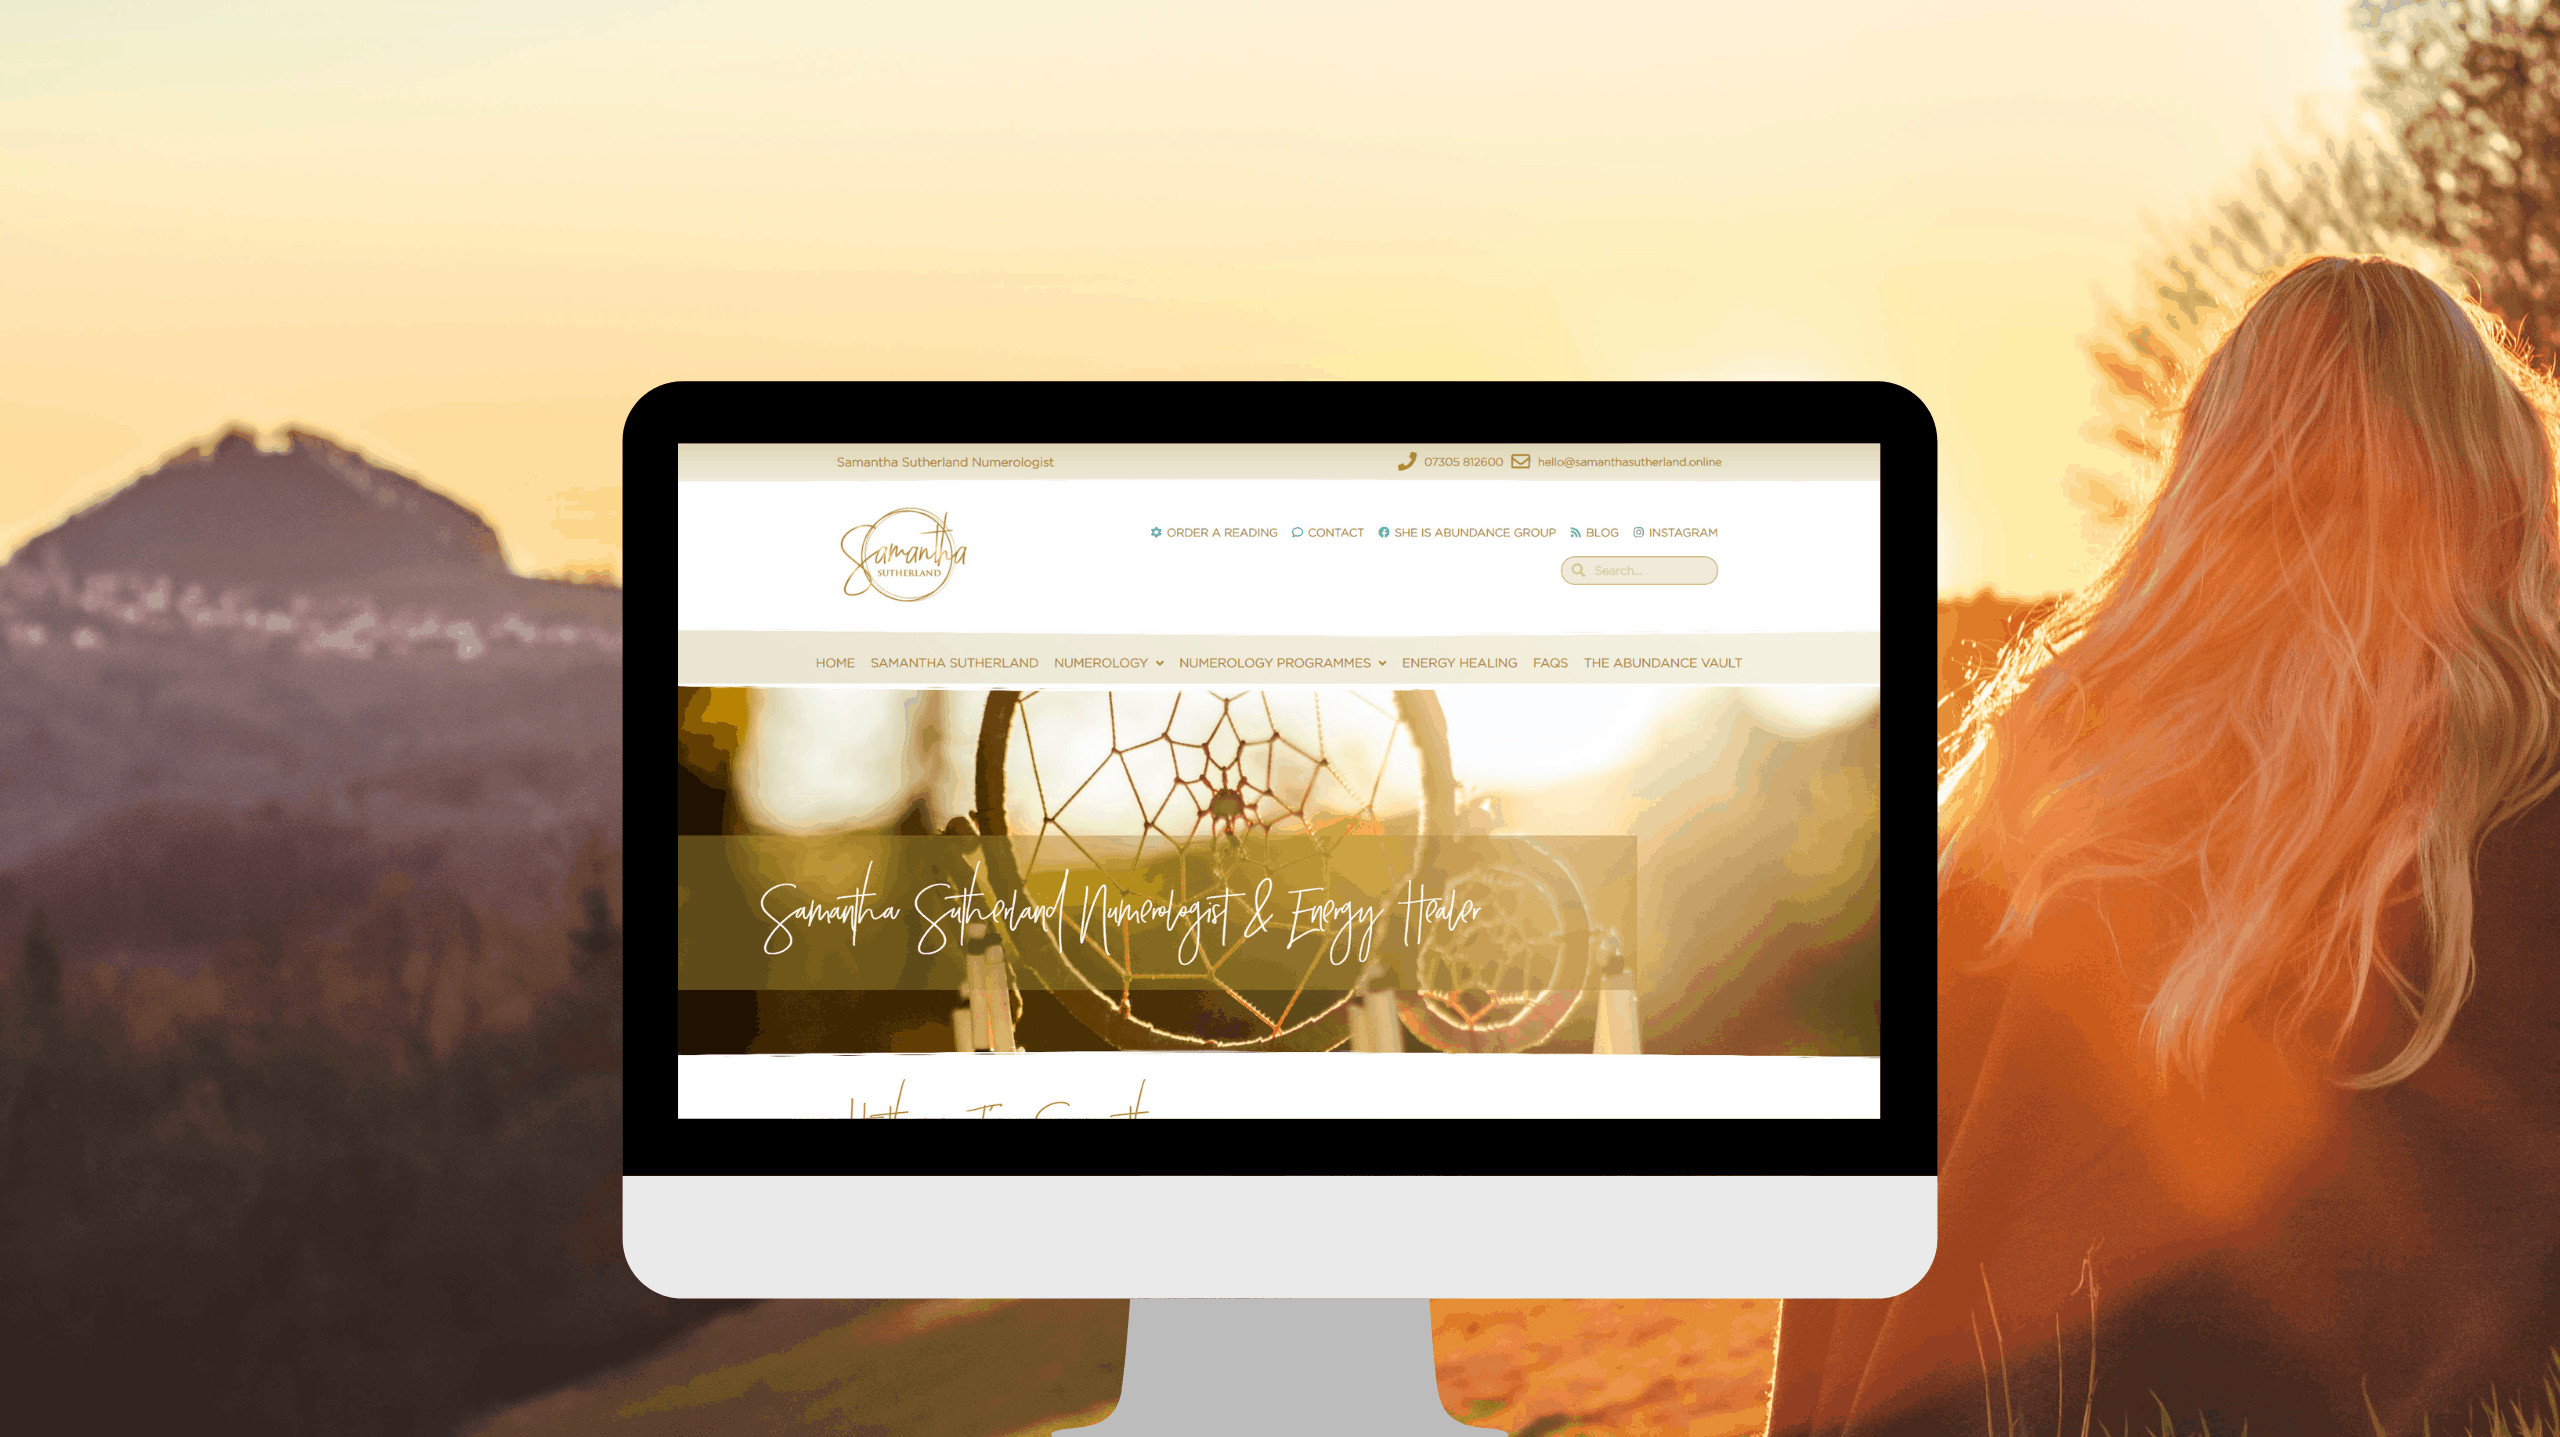 Samantha-Sutherland-Numerologist-Energy-Healing-Website